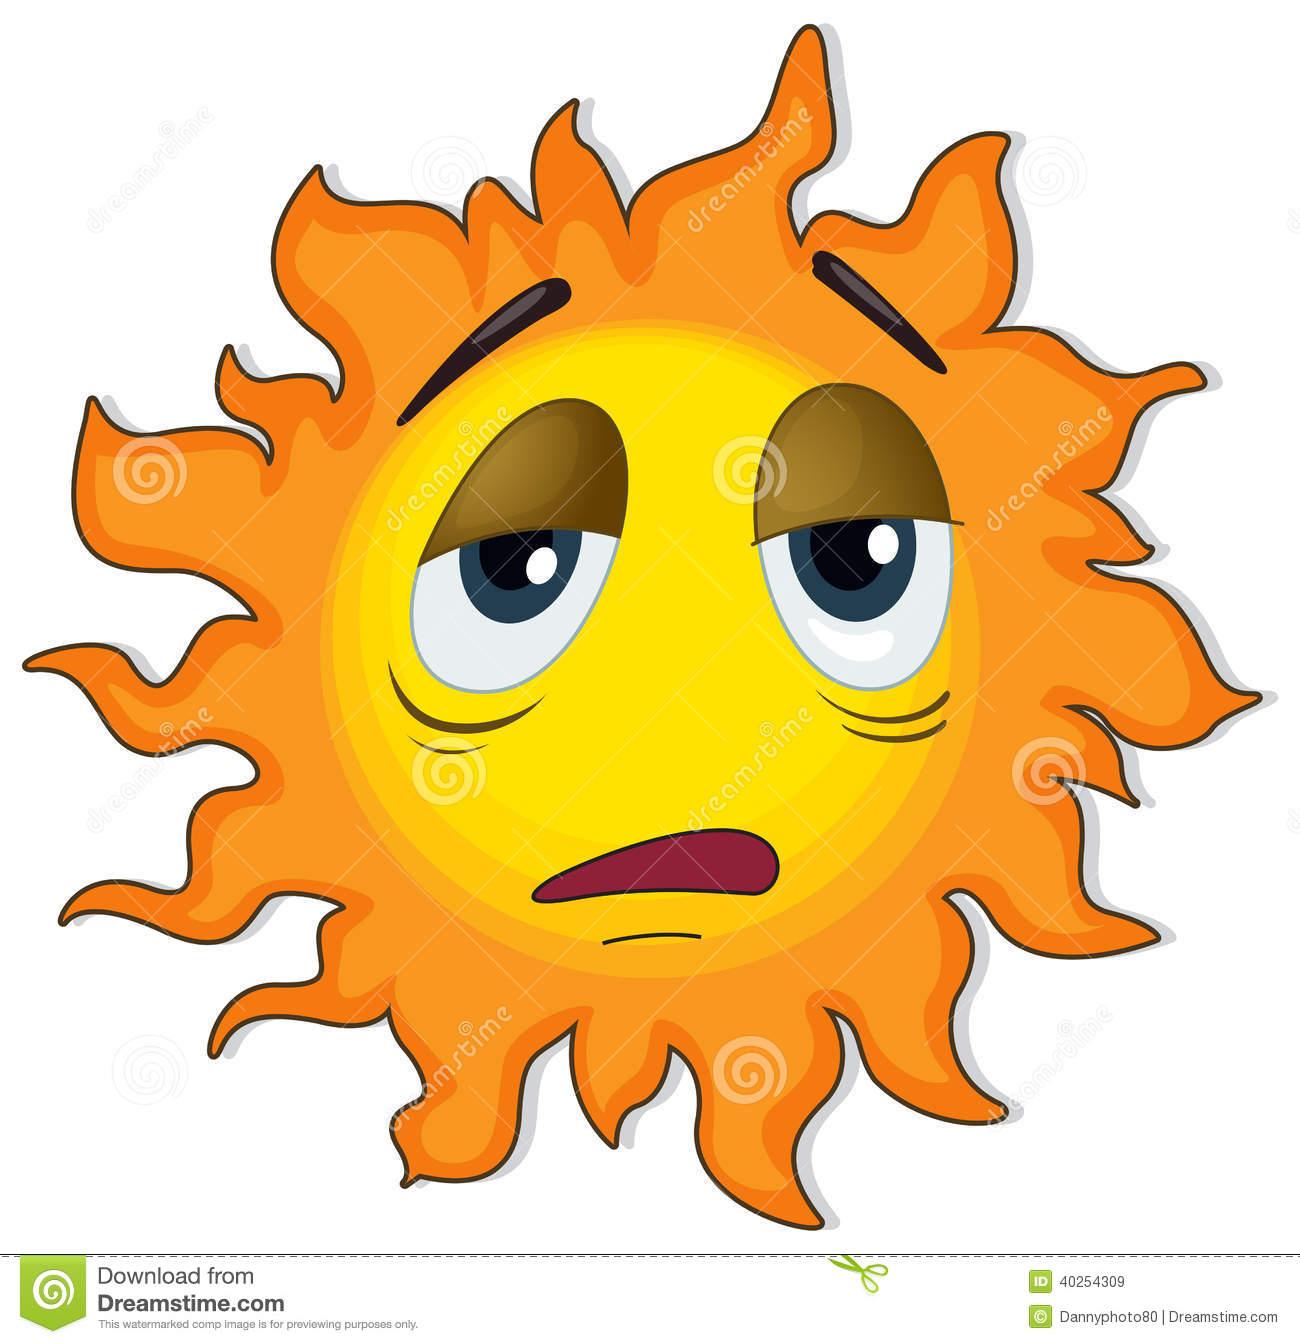 Saule lec nogurusi